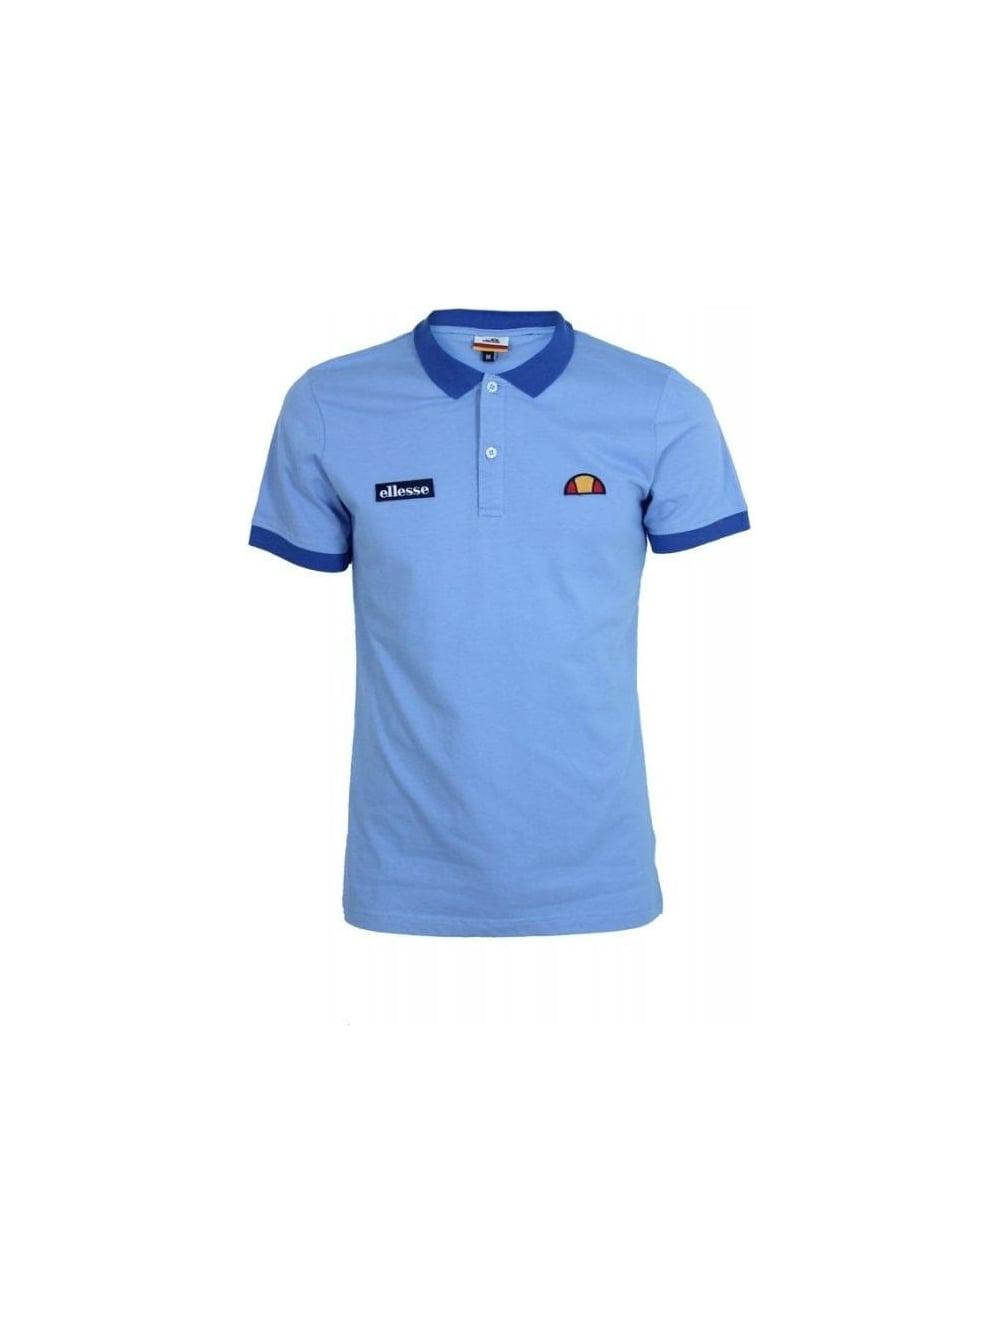 61ca8239fe Ellesse Lessepsia Polo - Placid Blue